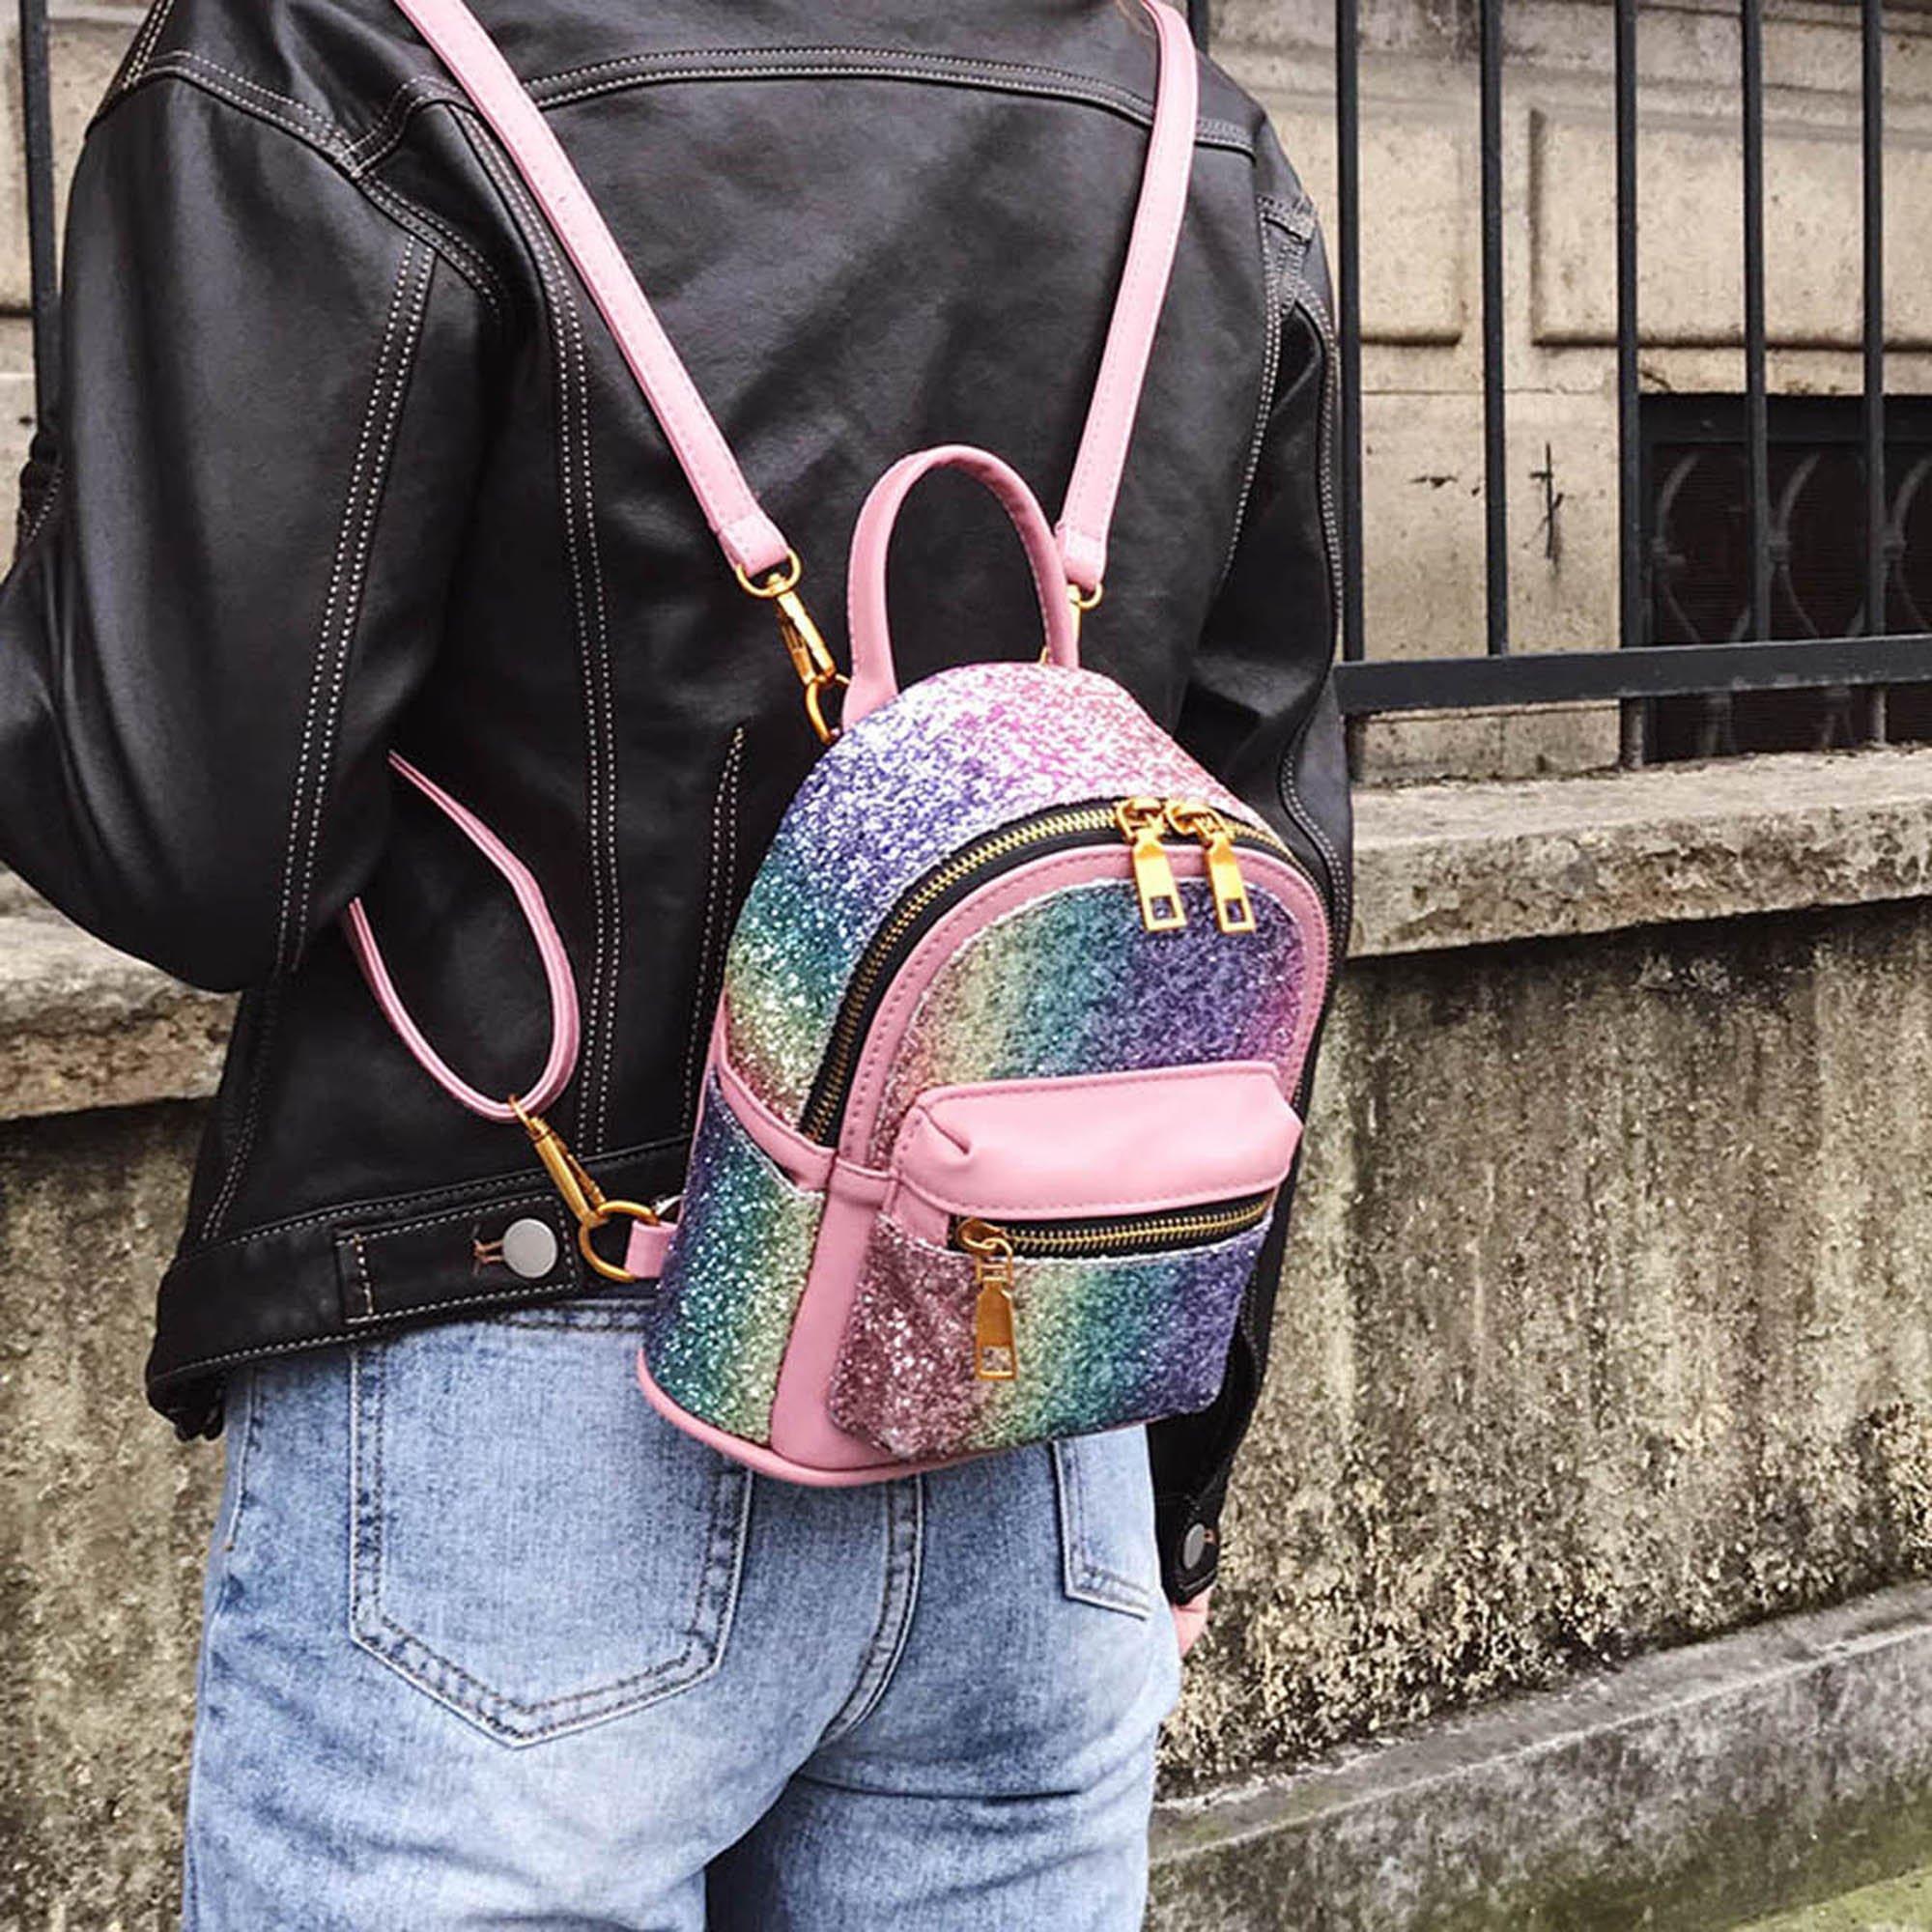 Girls Bling Mini Travel Backpack Kids Children School Bags Satchel Purses Daypack (pink rainbow) by JIANBAO (Image #3)